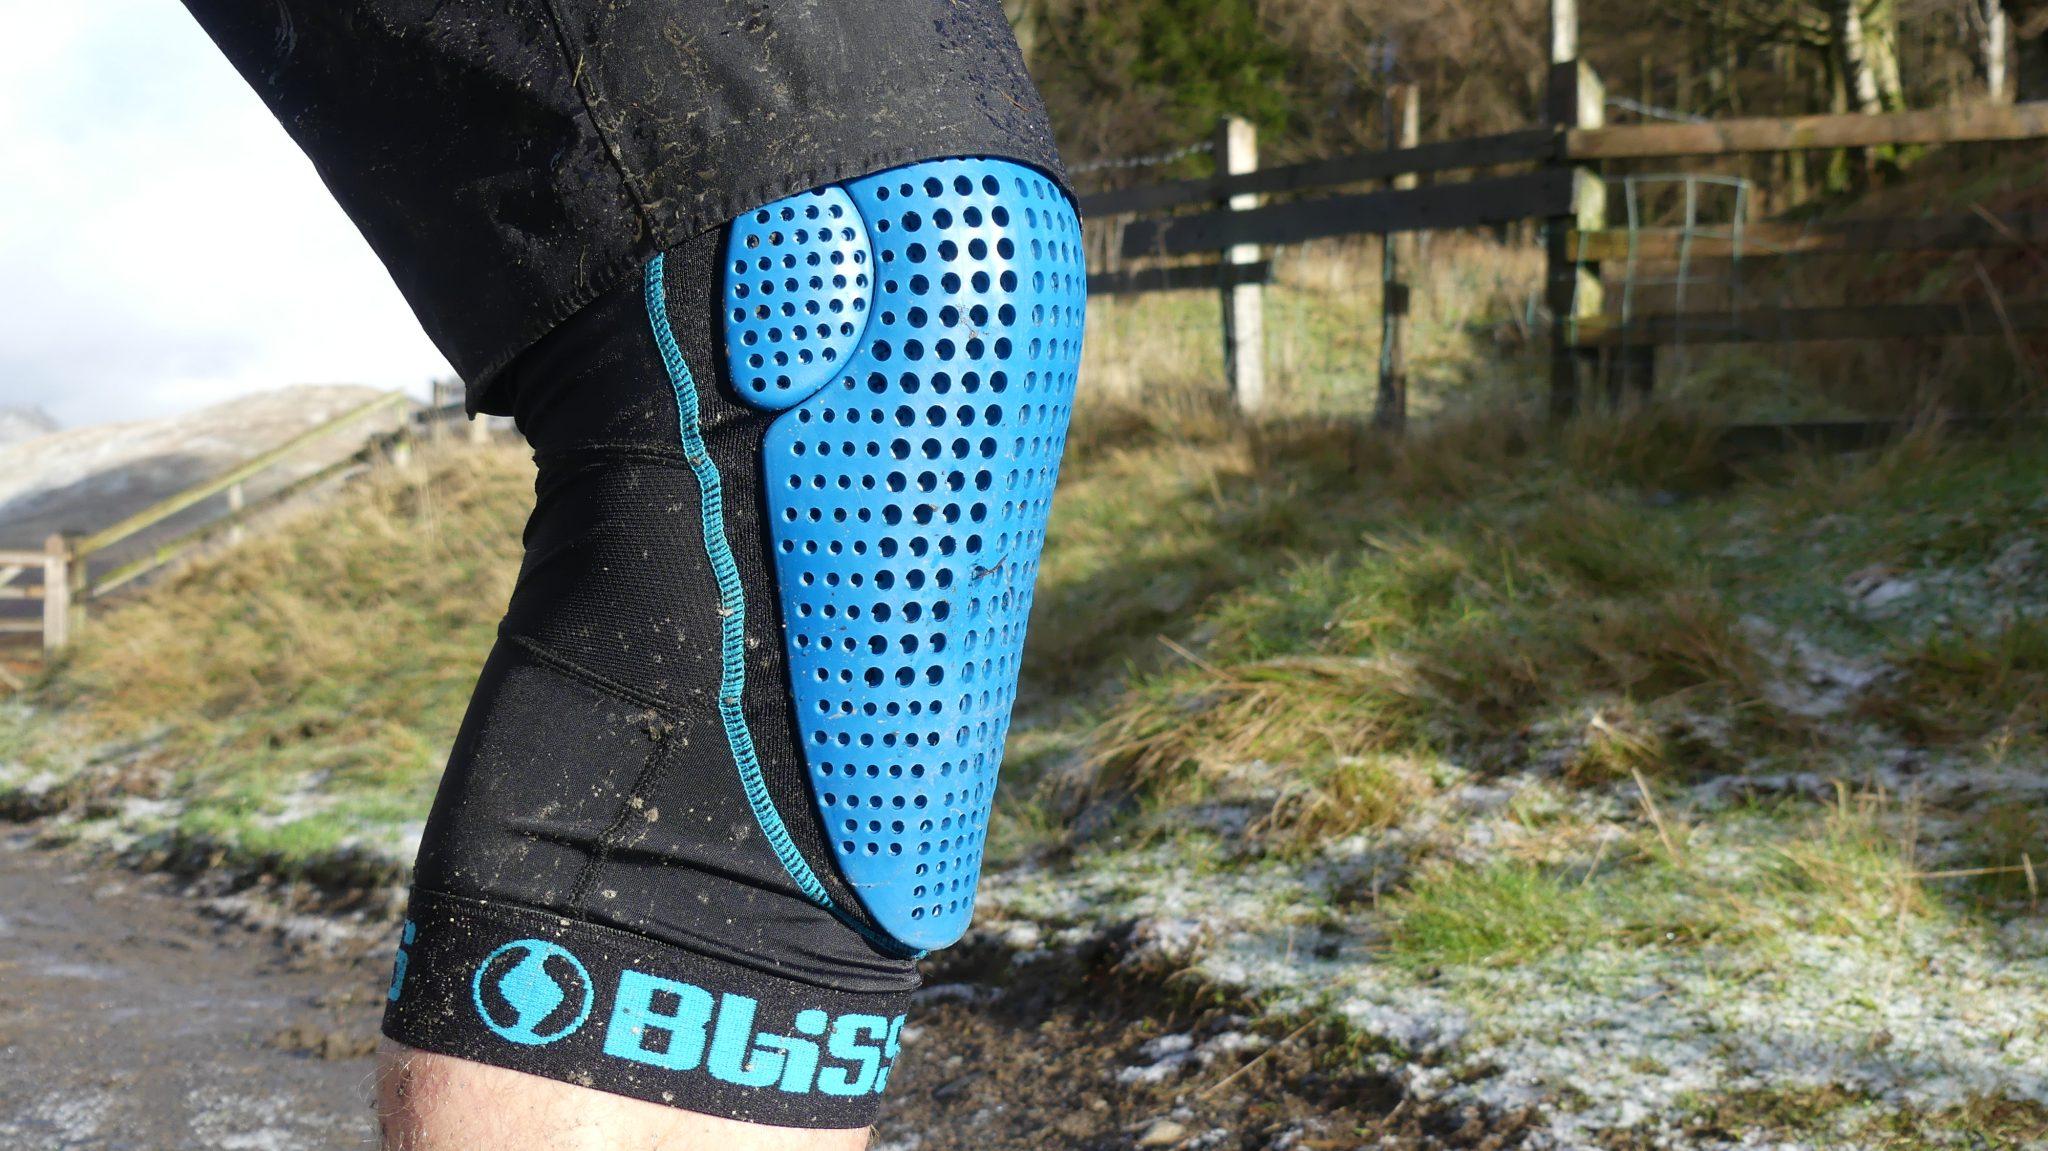 Coude Pad-Medium-Bliss Protection ARG minimaliste